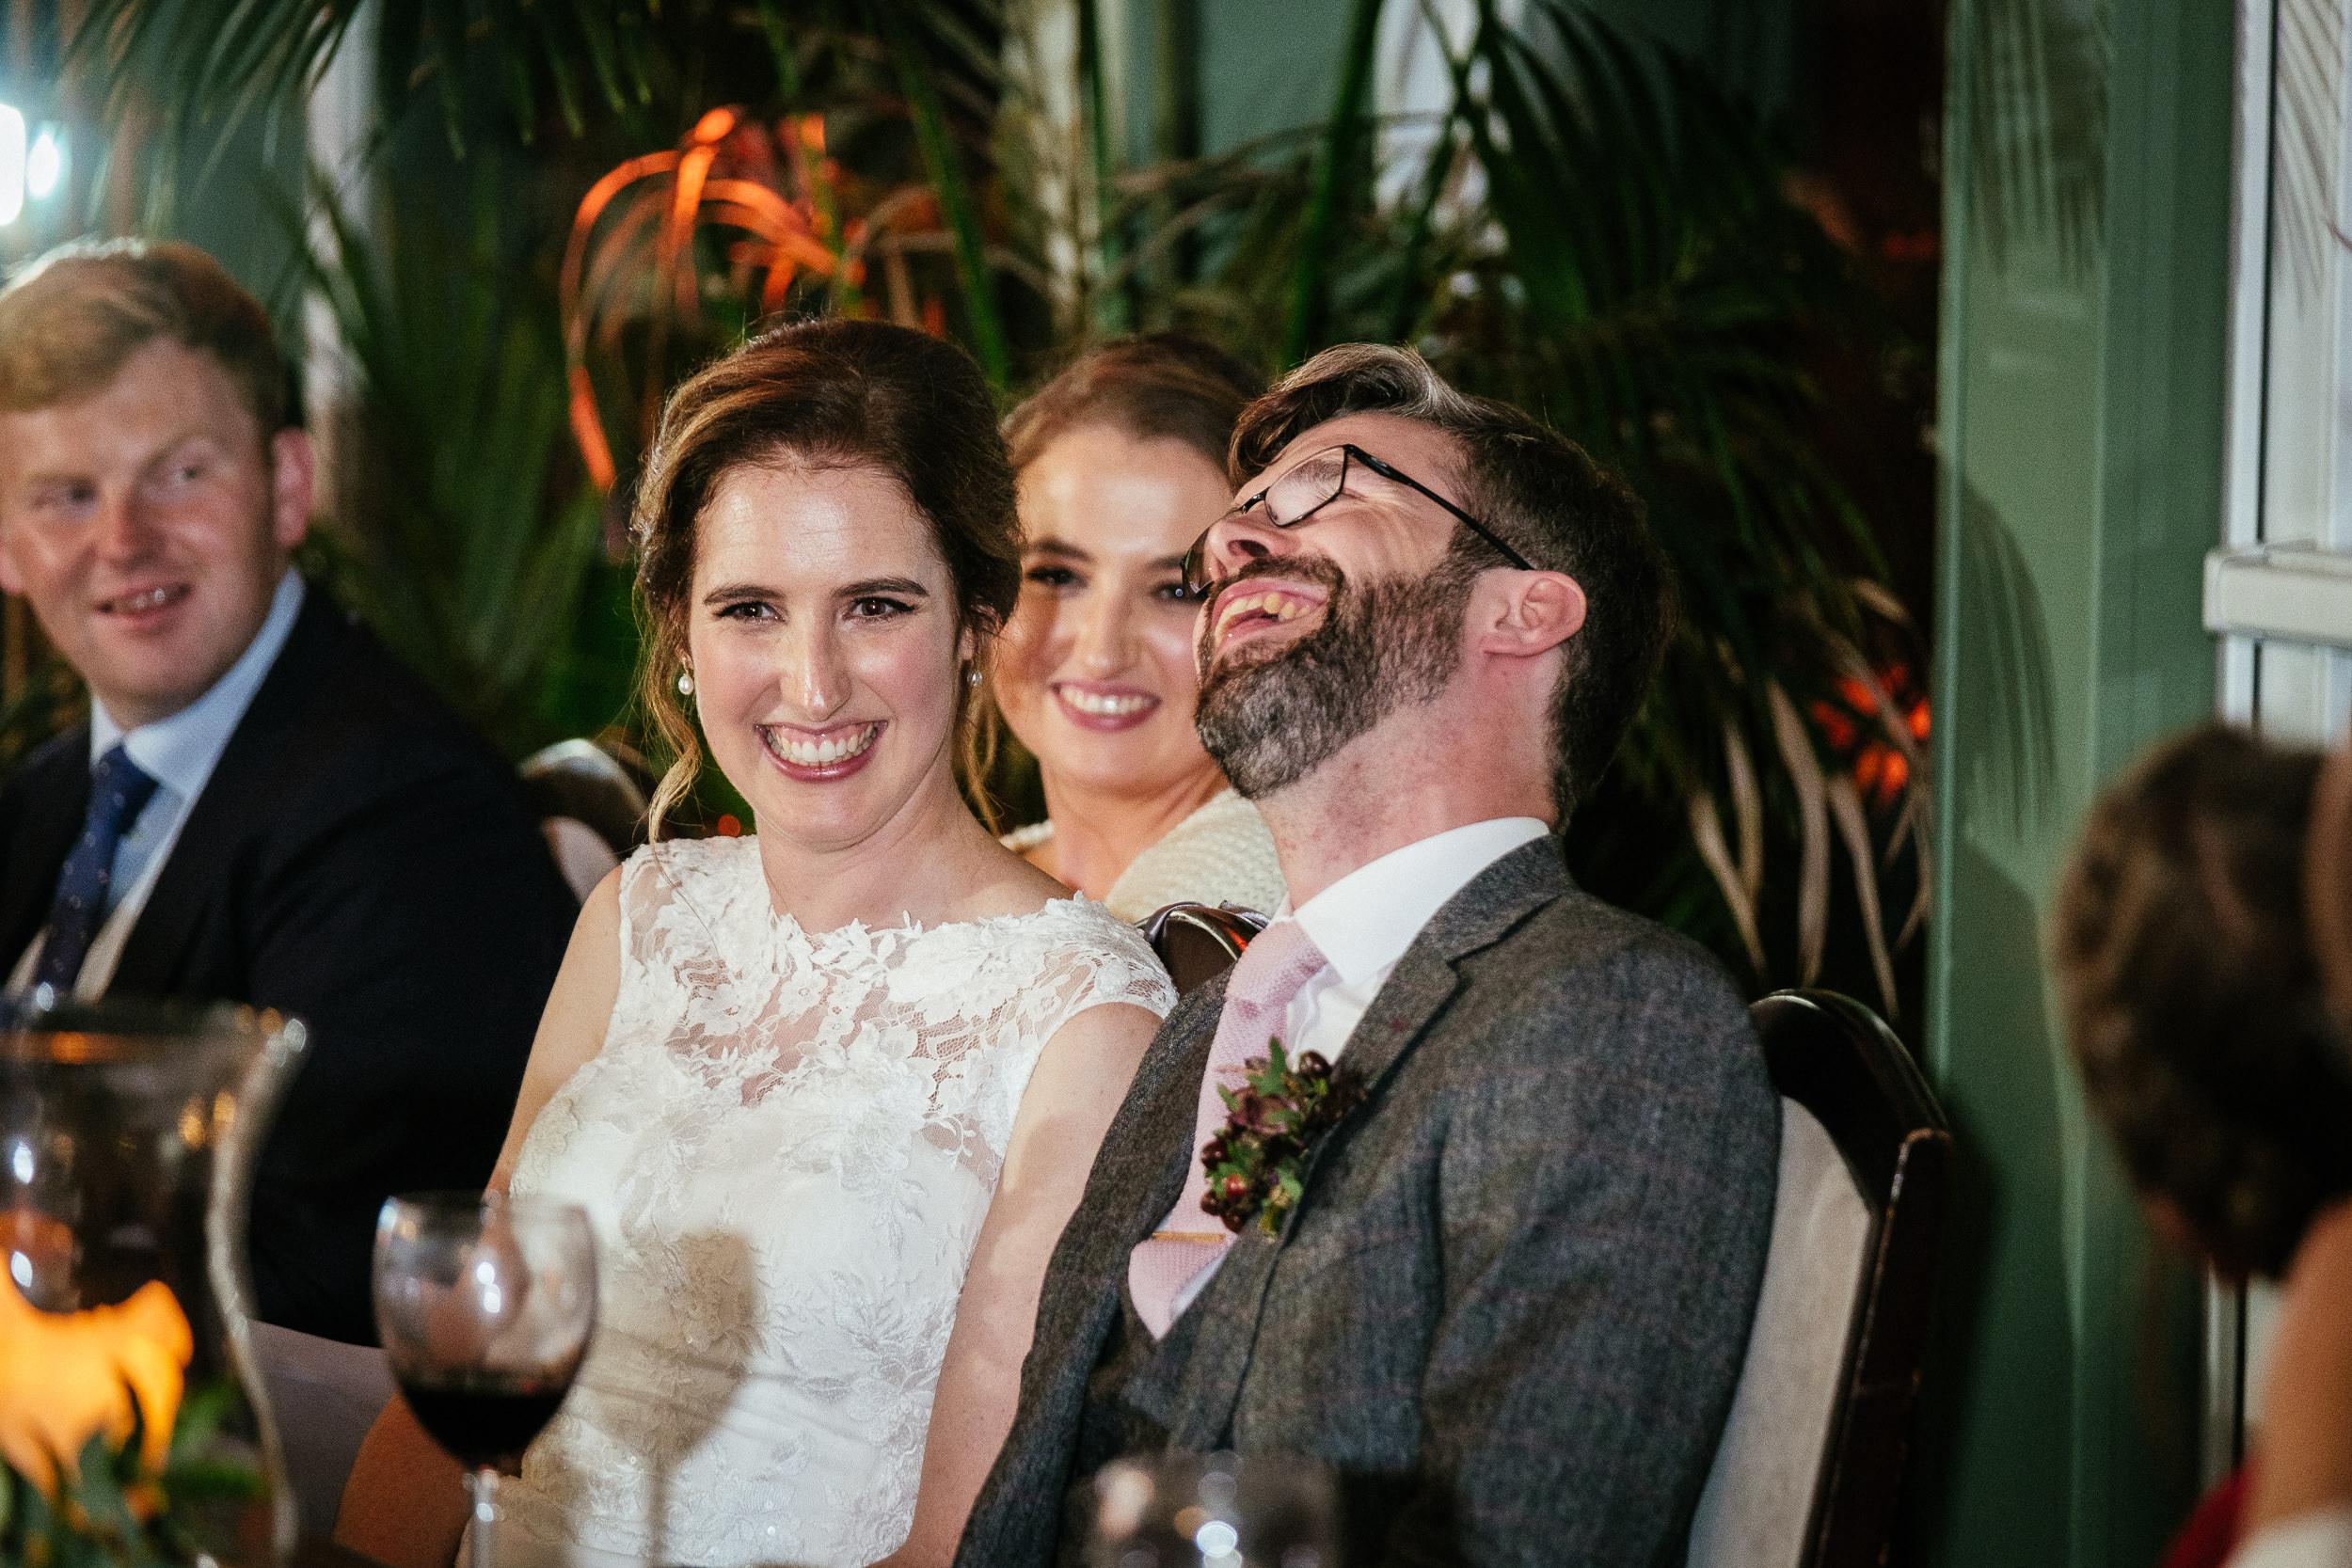 tinakilly house Wedding Photographer101